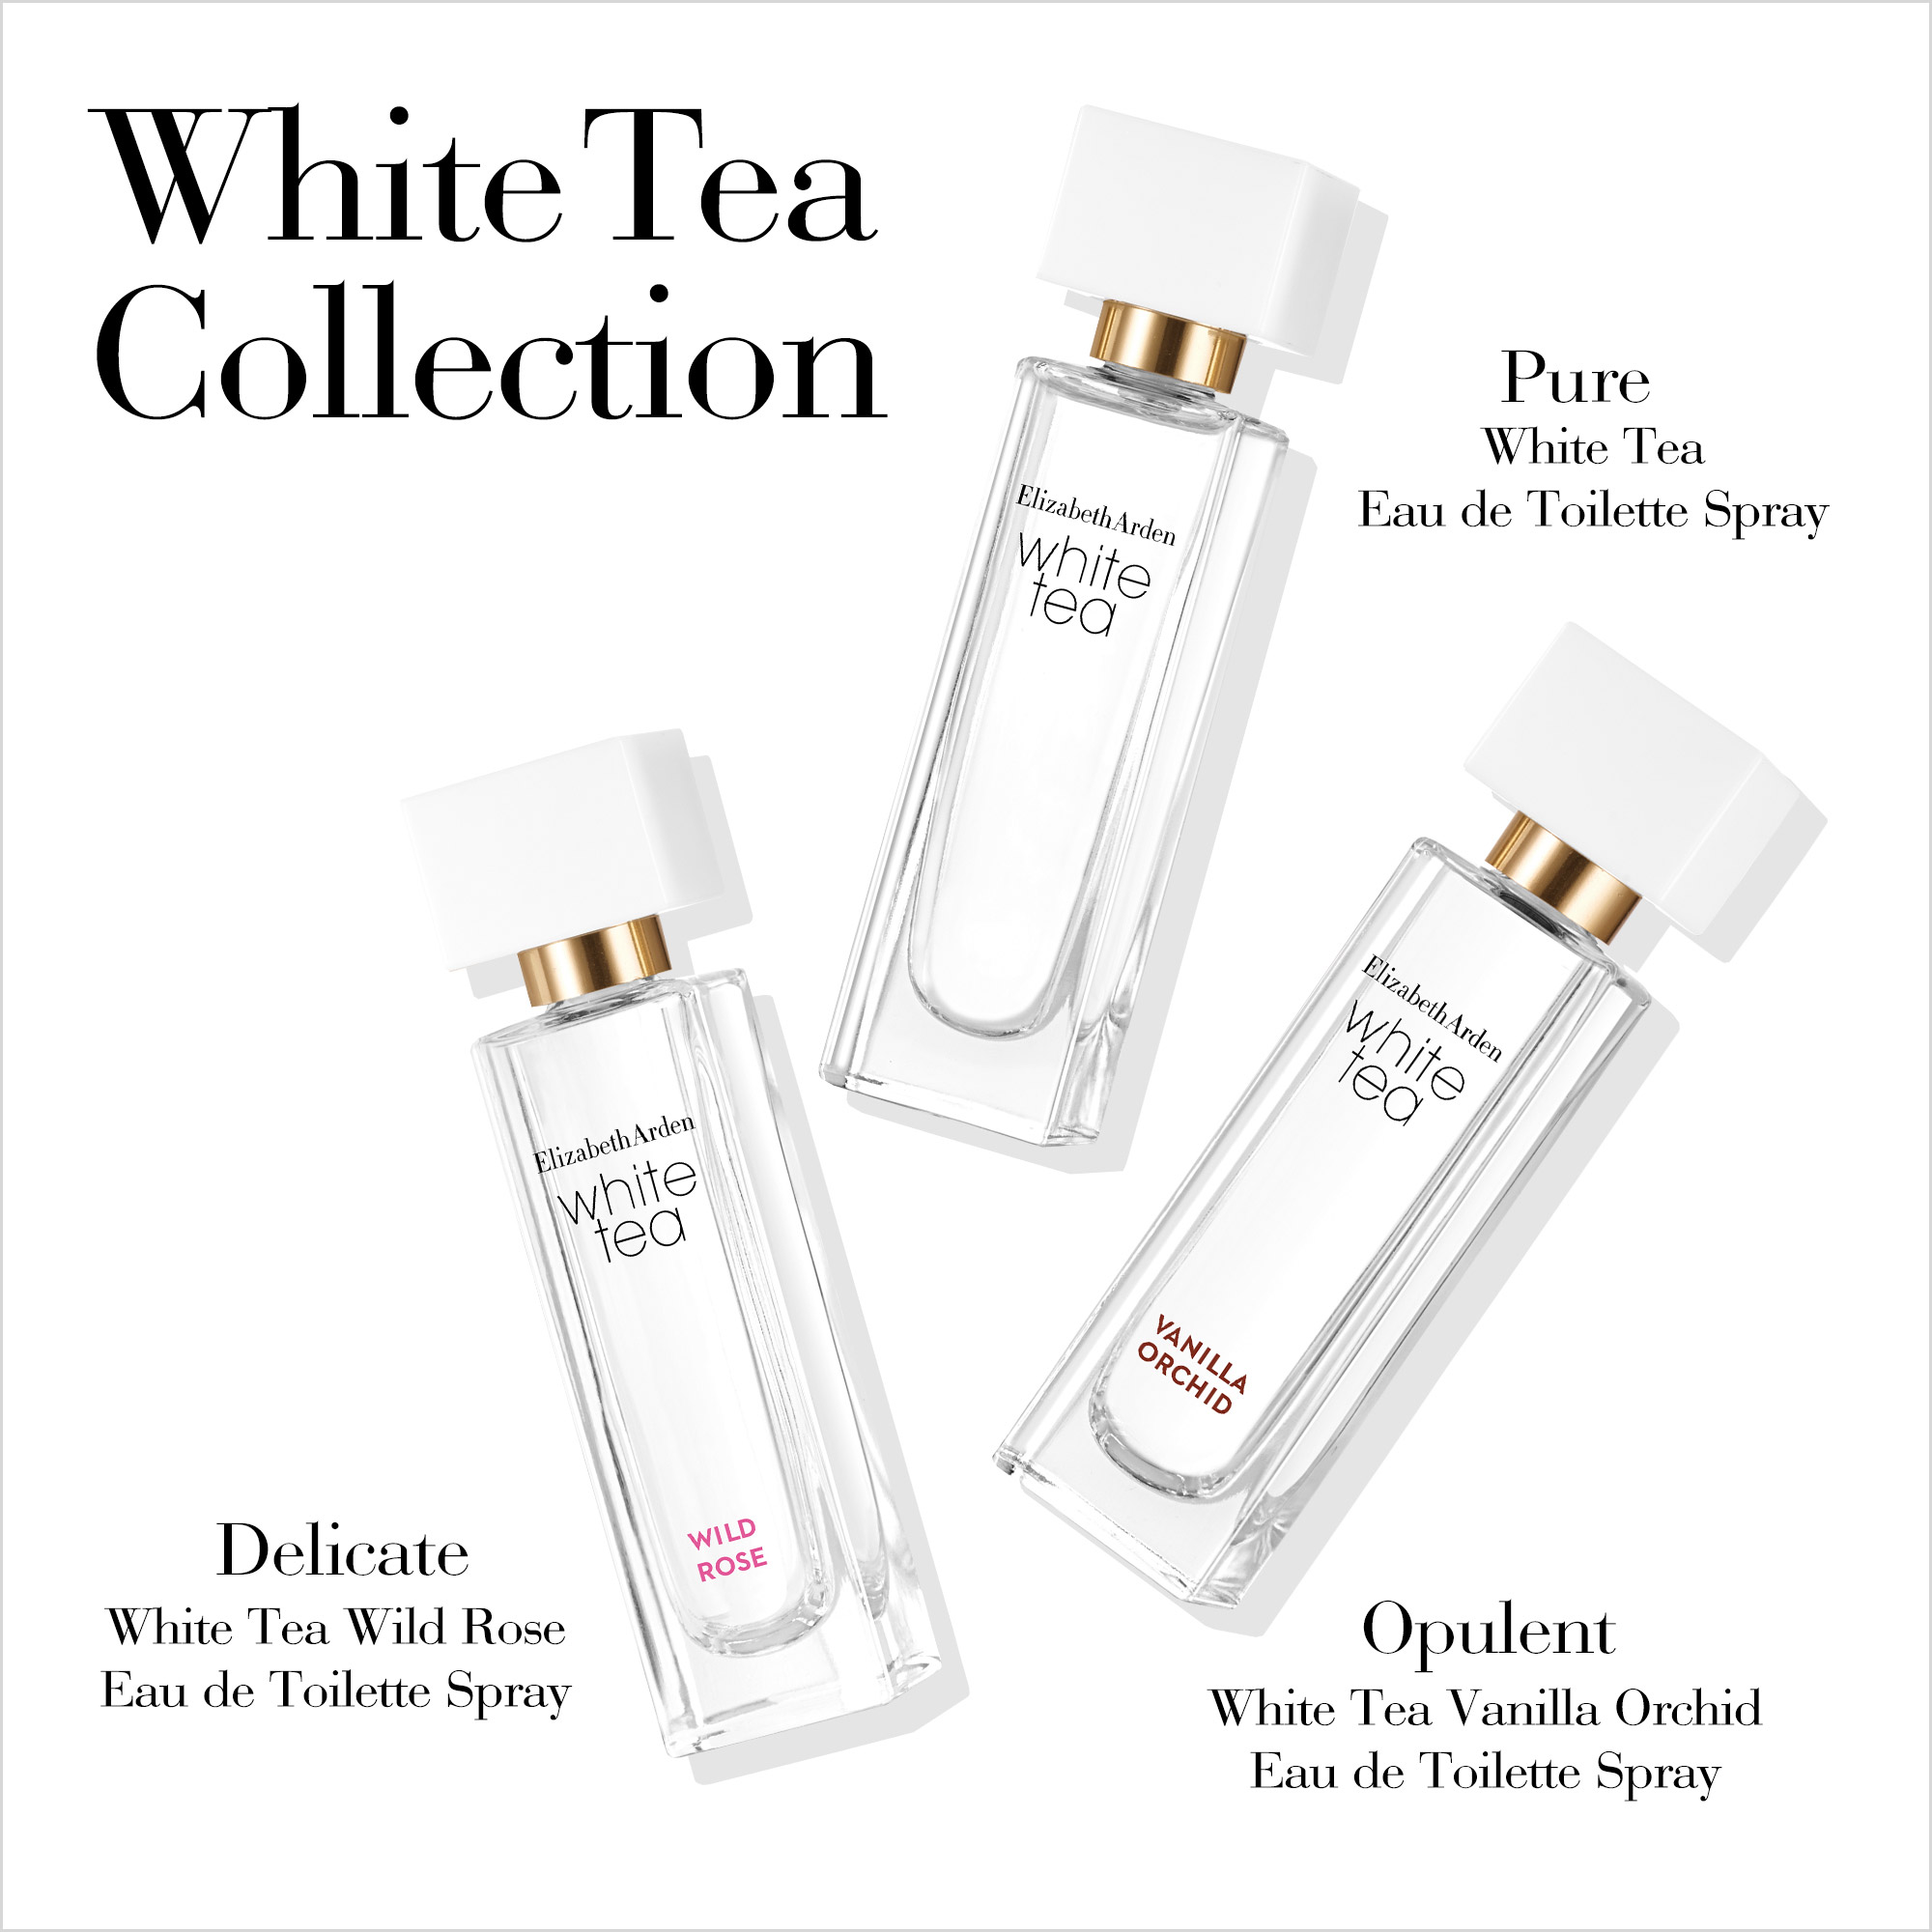 White Tea Collection